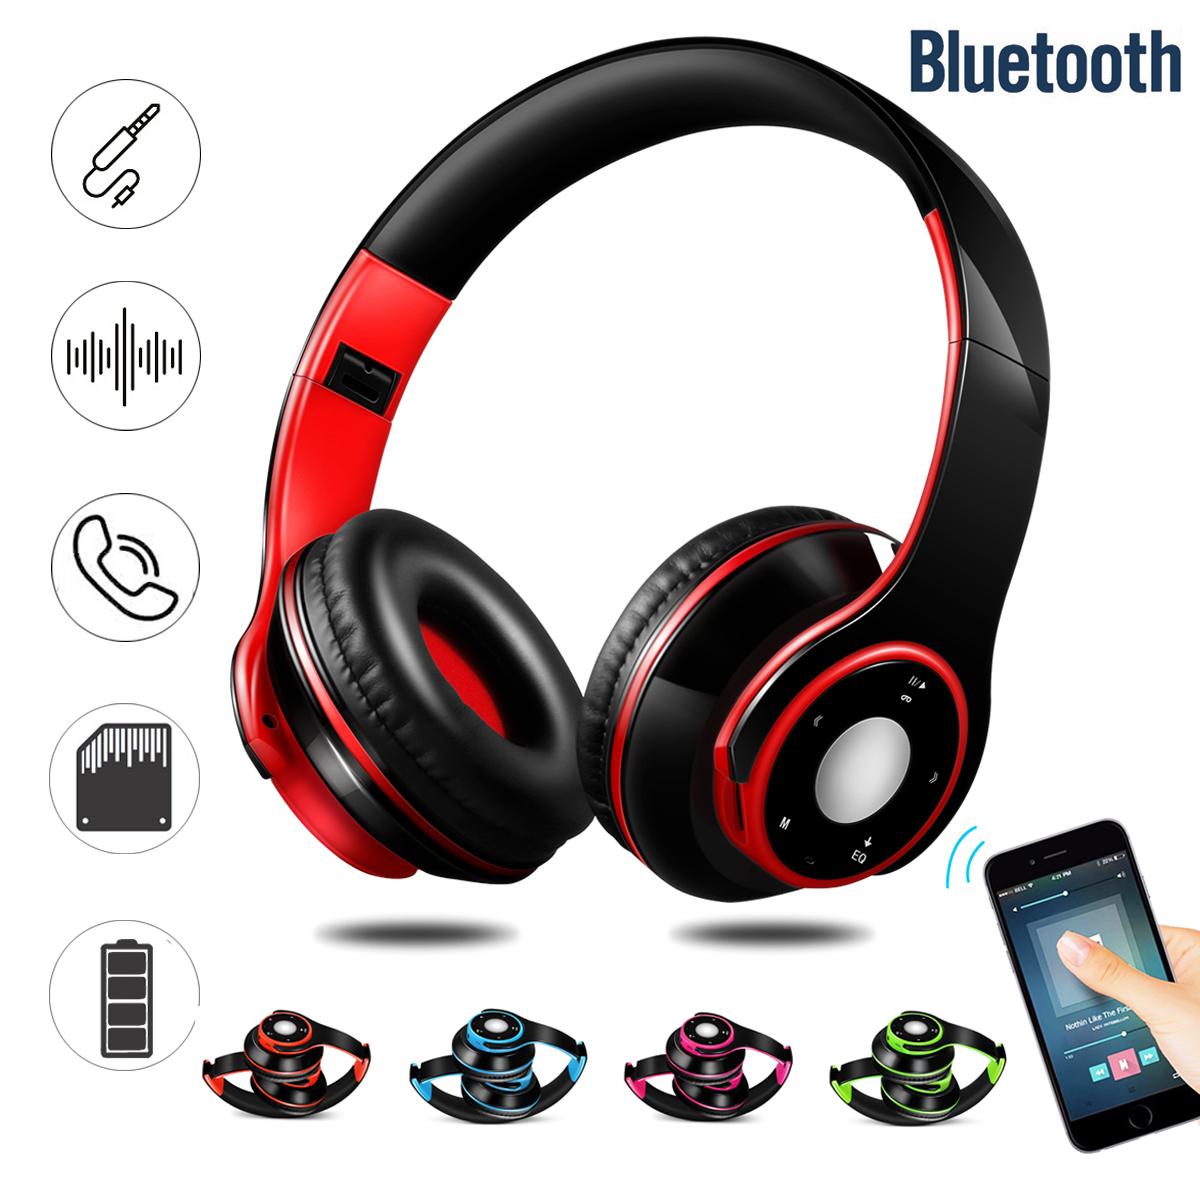 Portable Wireless Hifi Stereo Foldable Bluetooth Sports Headphone Headset Mic SD AUX